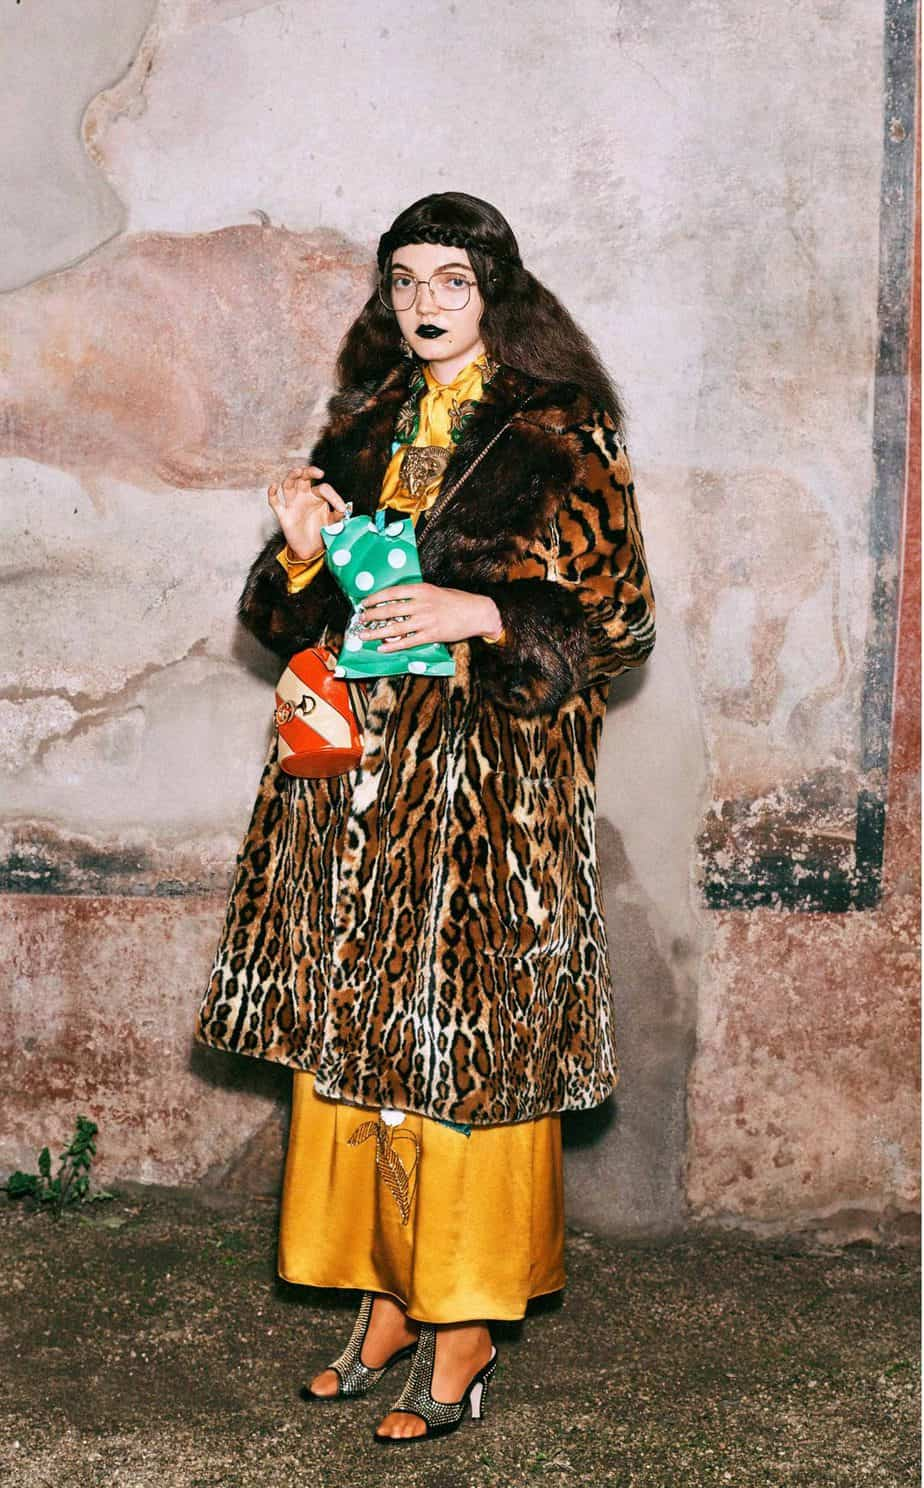 GUCCI, FALL 2019. WOMEN'S FASHION, Photographer Harmony Korine, Art Director, Christopher Simmonds - 48